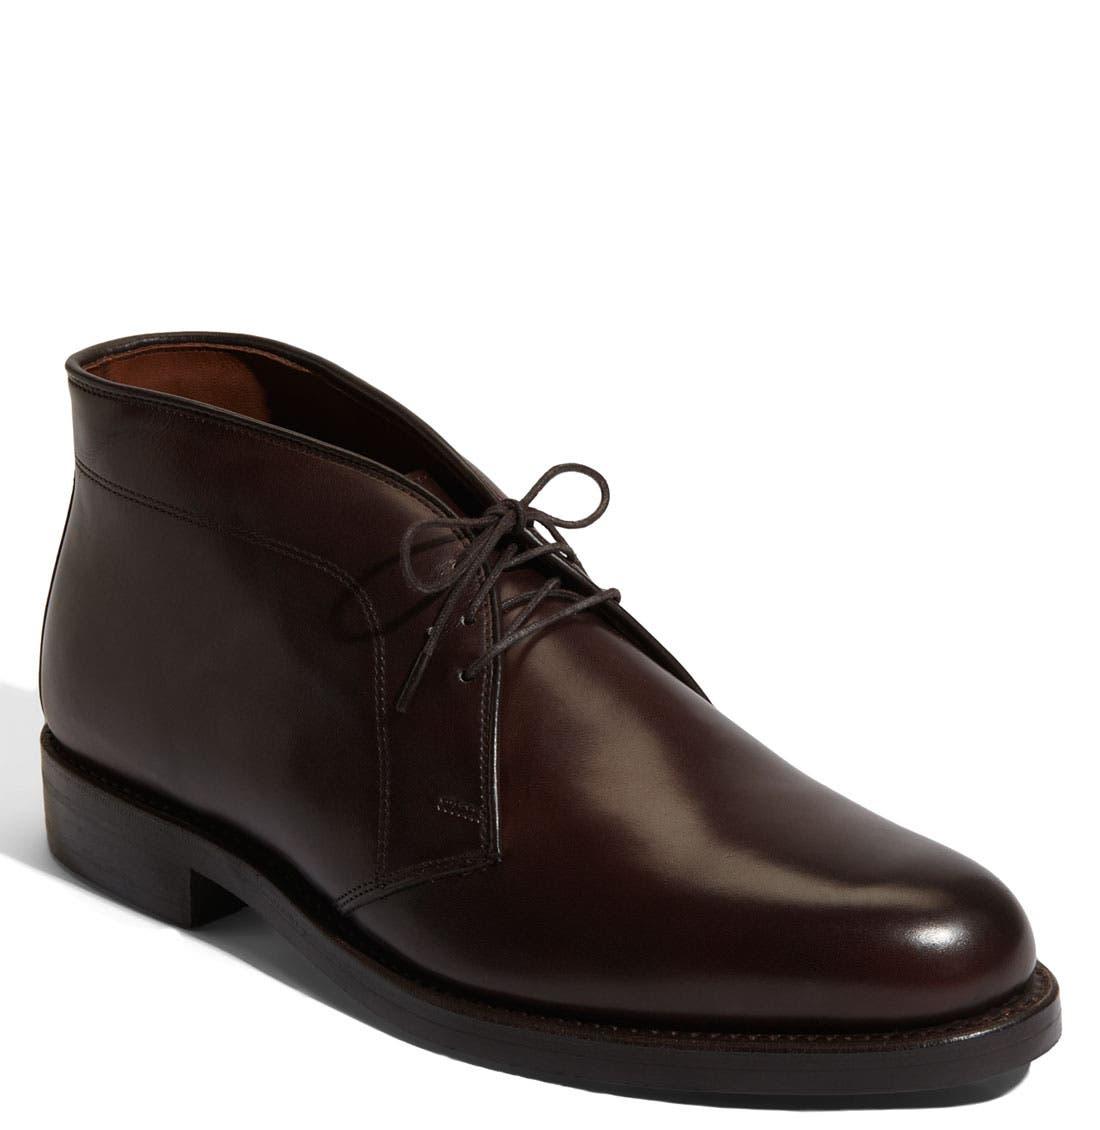 Alternate Image 1 Selected - Allen Edmonds 'Malvern' Chukka Boot (Online Only)